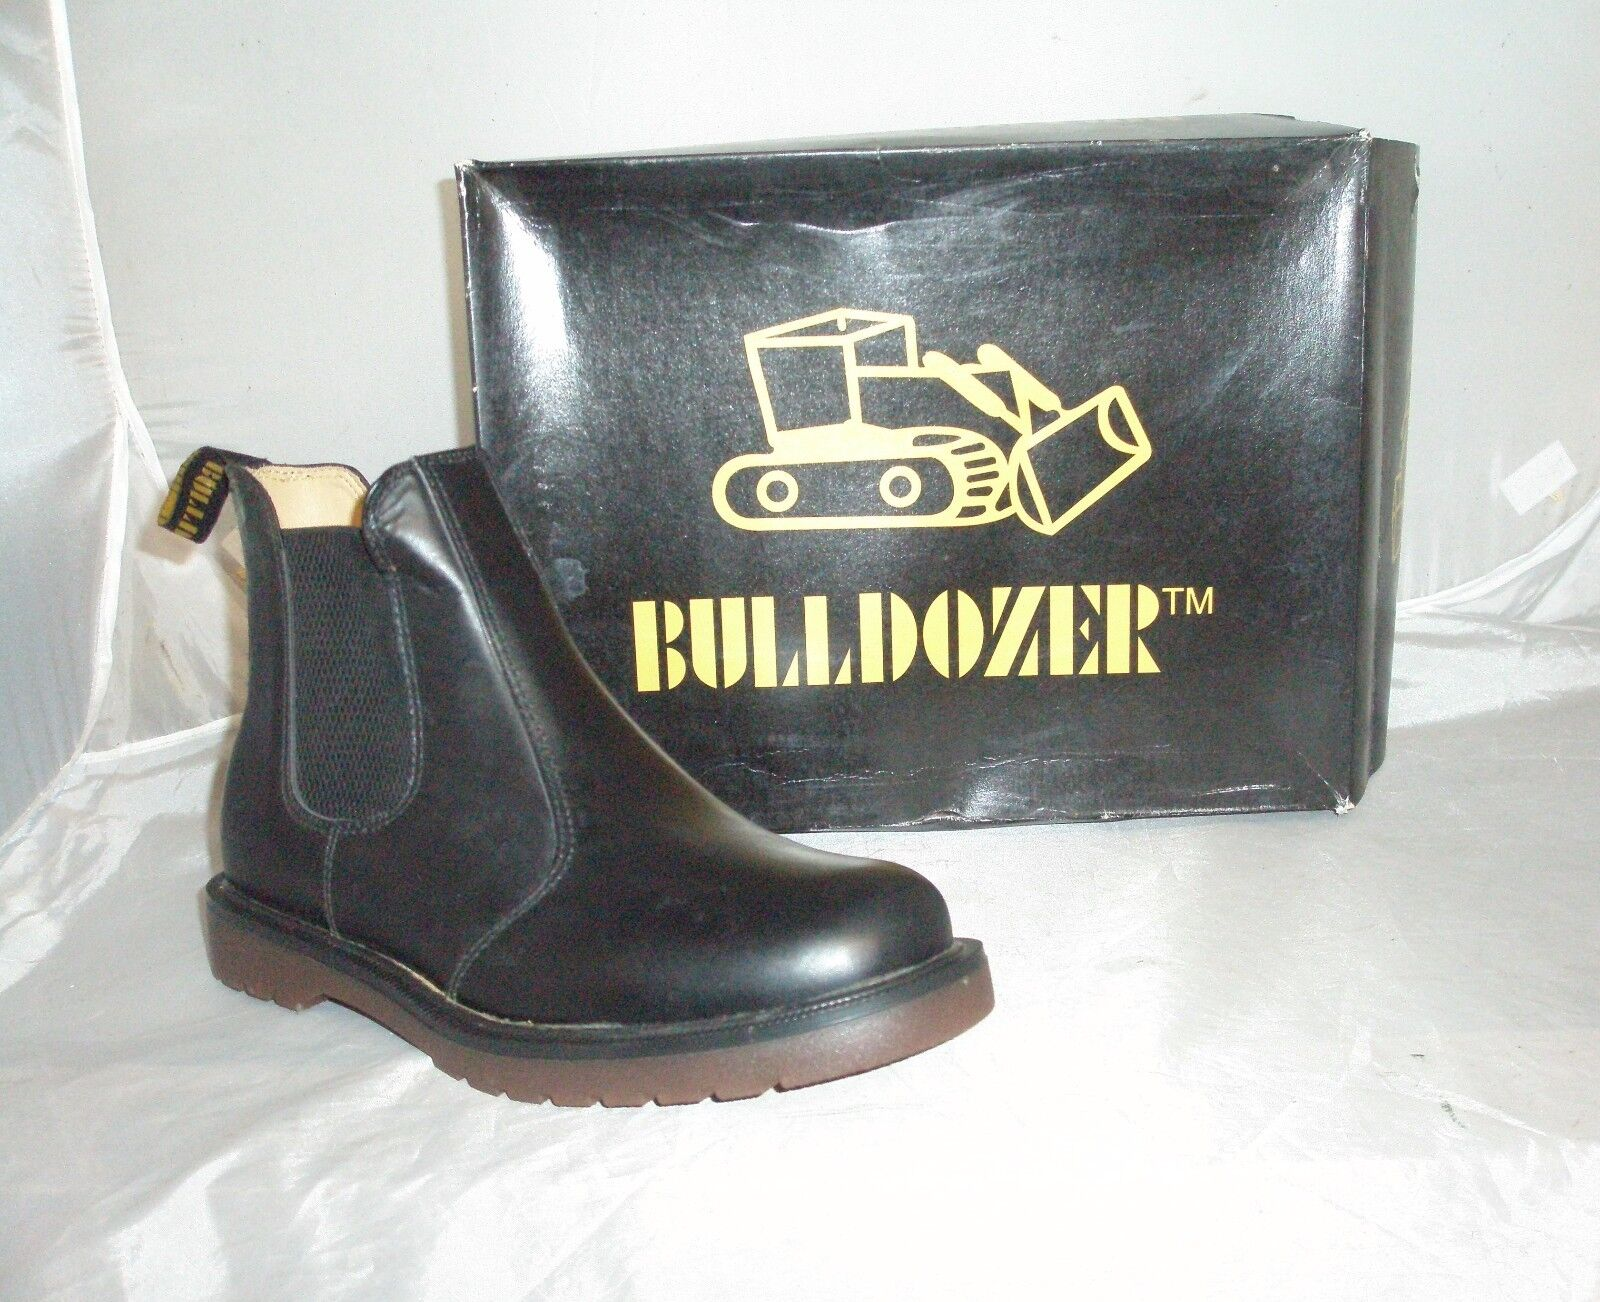 Bulldozer Black Leather Chelsea Boots Size 7